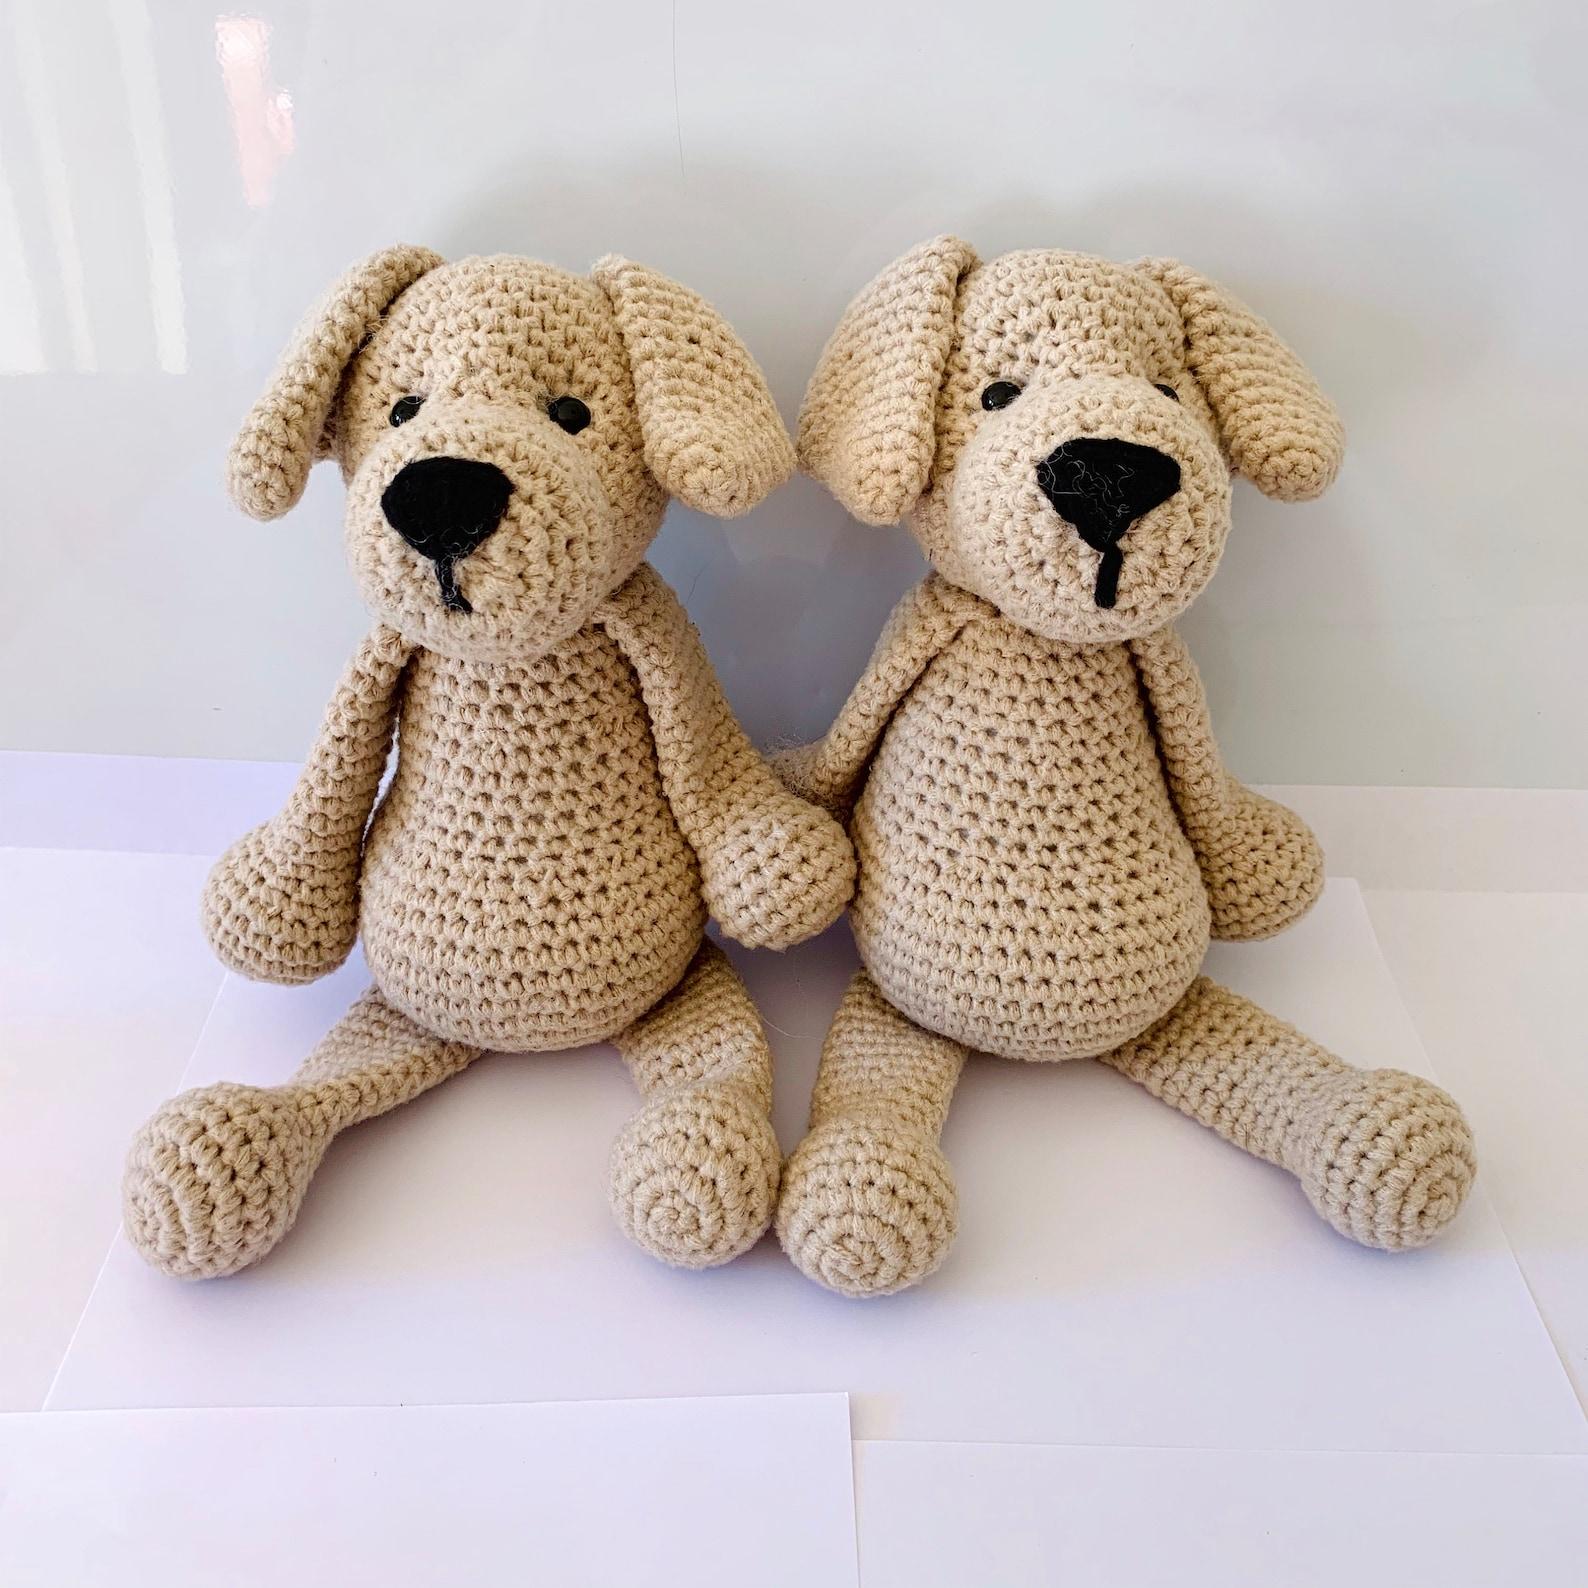 Labrador crochet toy